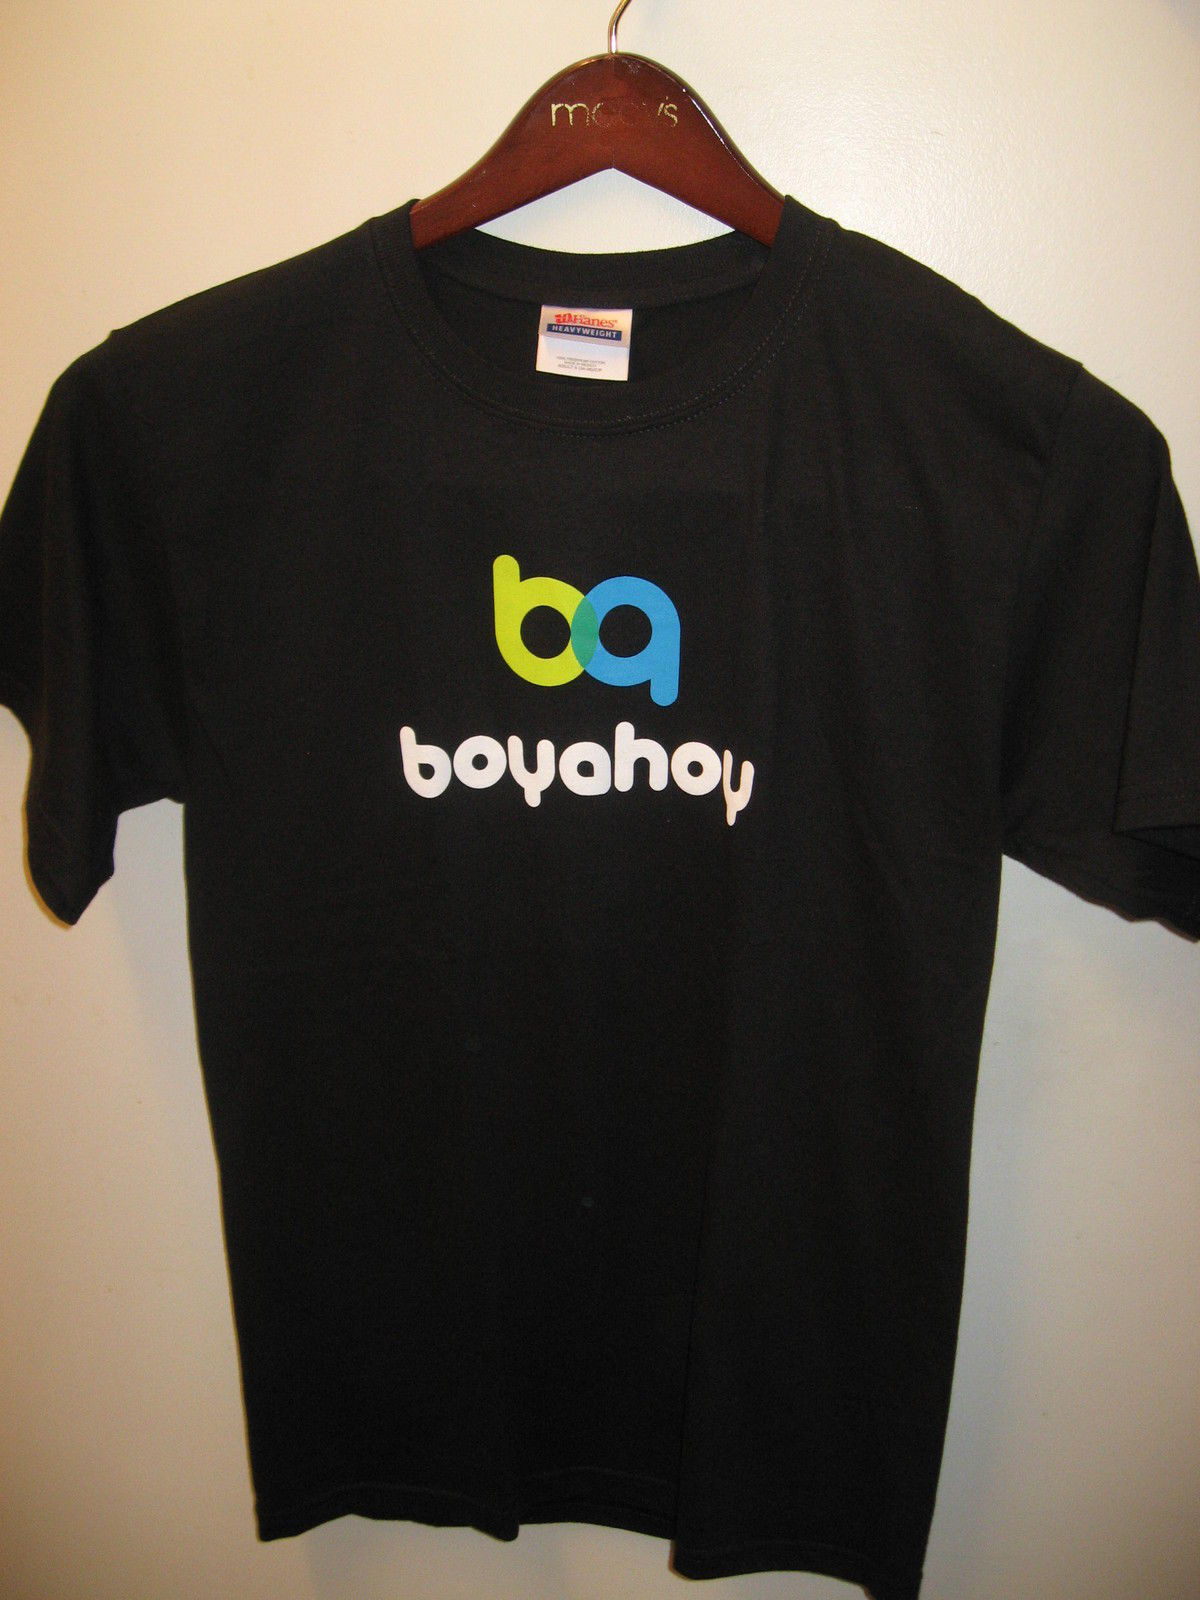 Boyahoy sign up